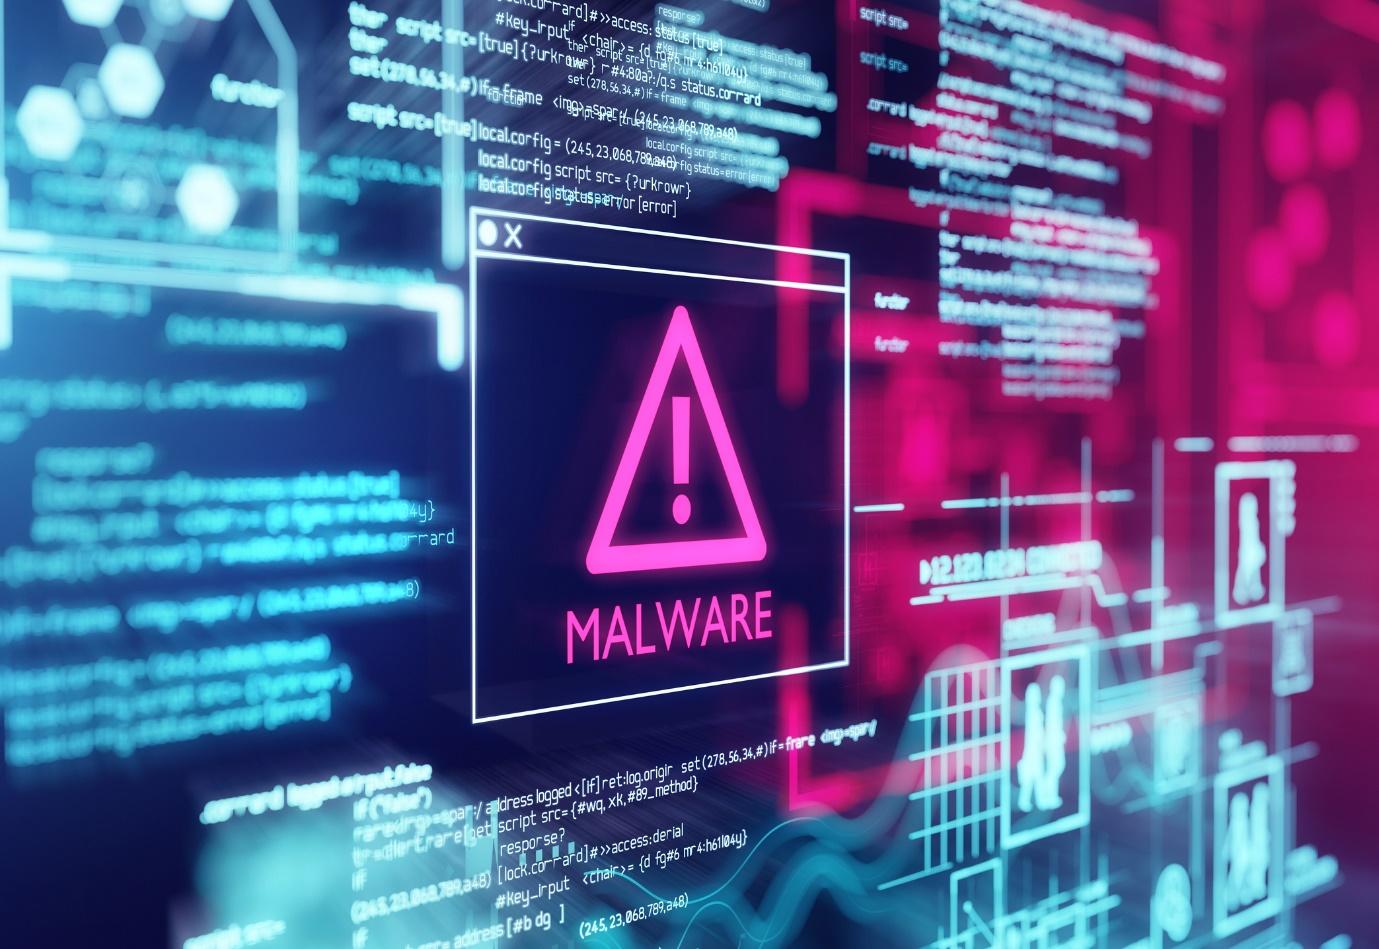 malware warning on screen